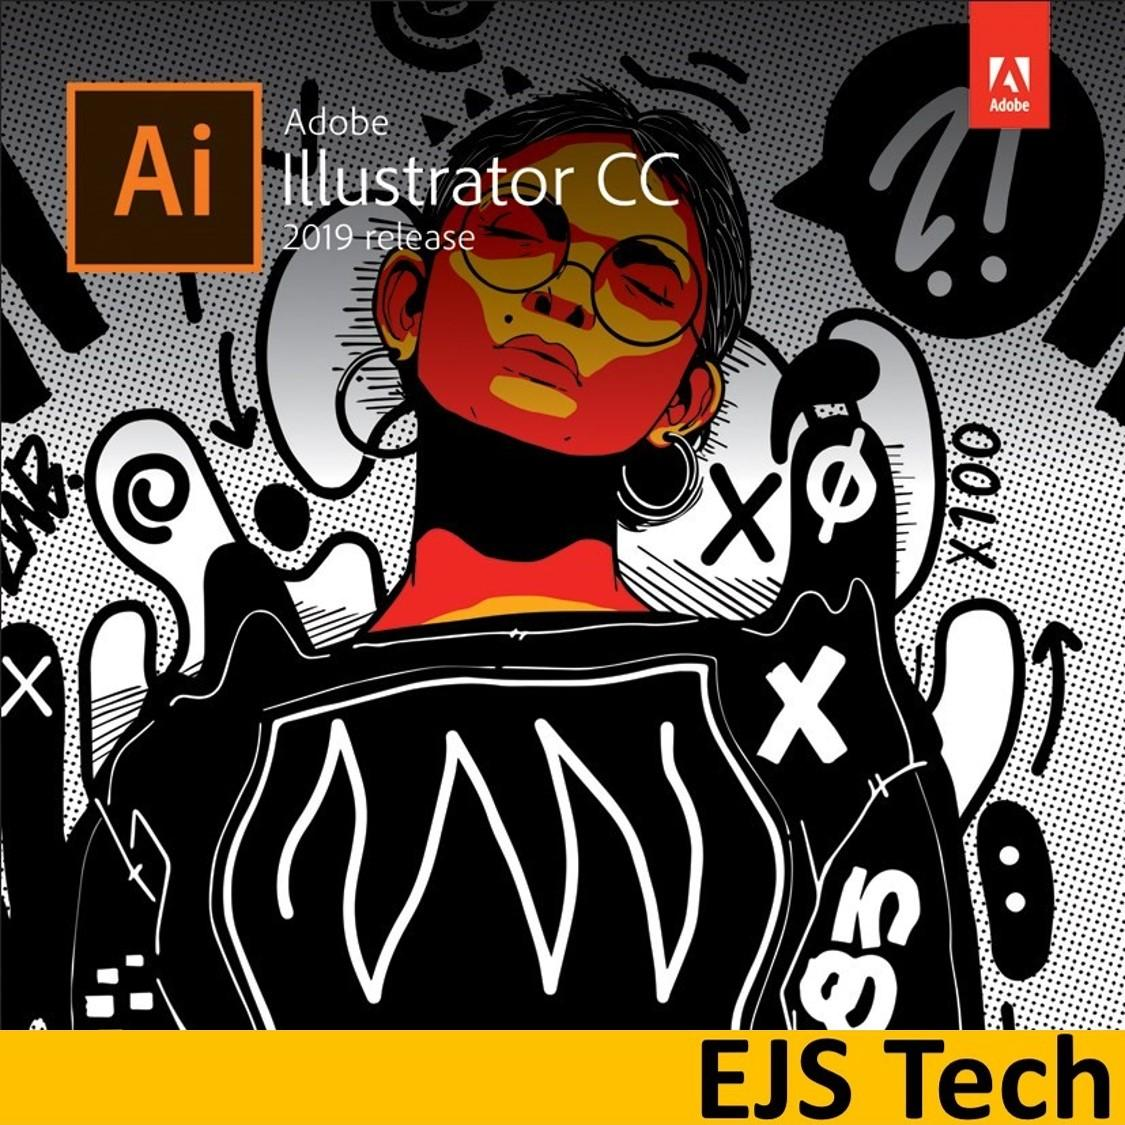 Genuine Adobe Illustrator CC 2019 (64-Bit Structure) Lifetime Digital  License